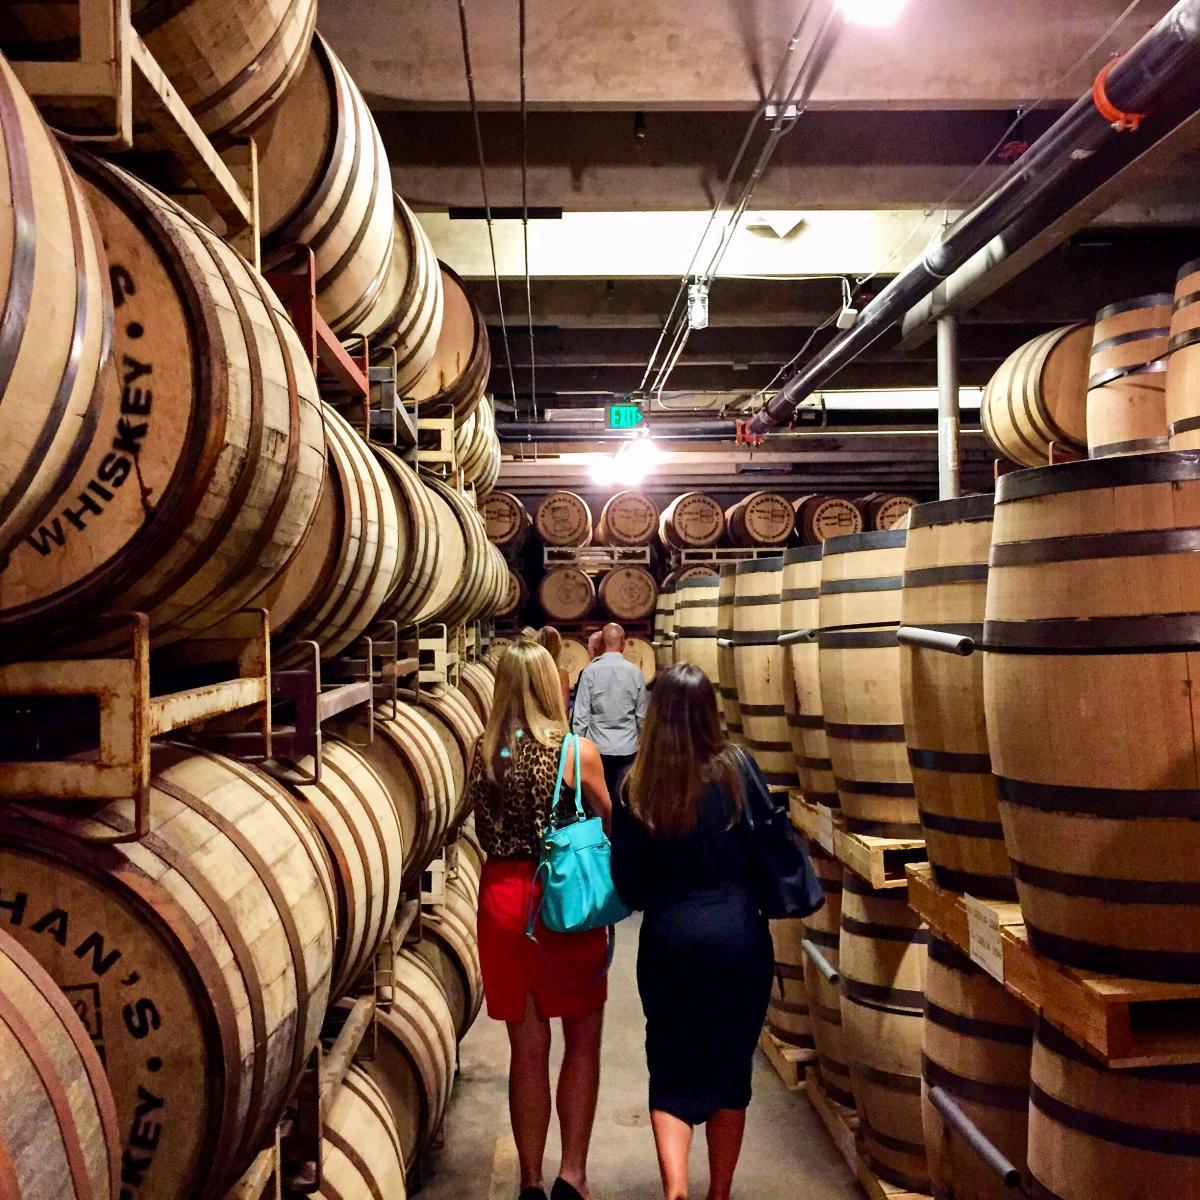 Stranahan's Colorado Whiskey barrels